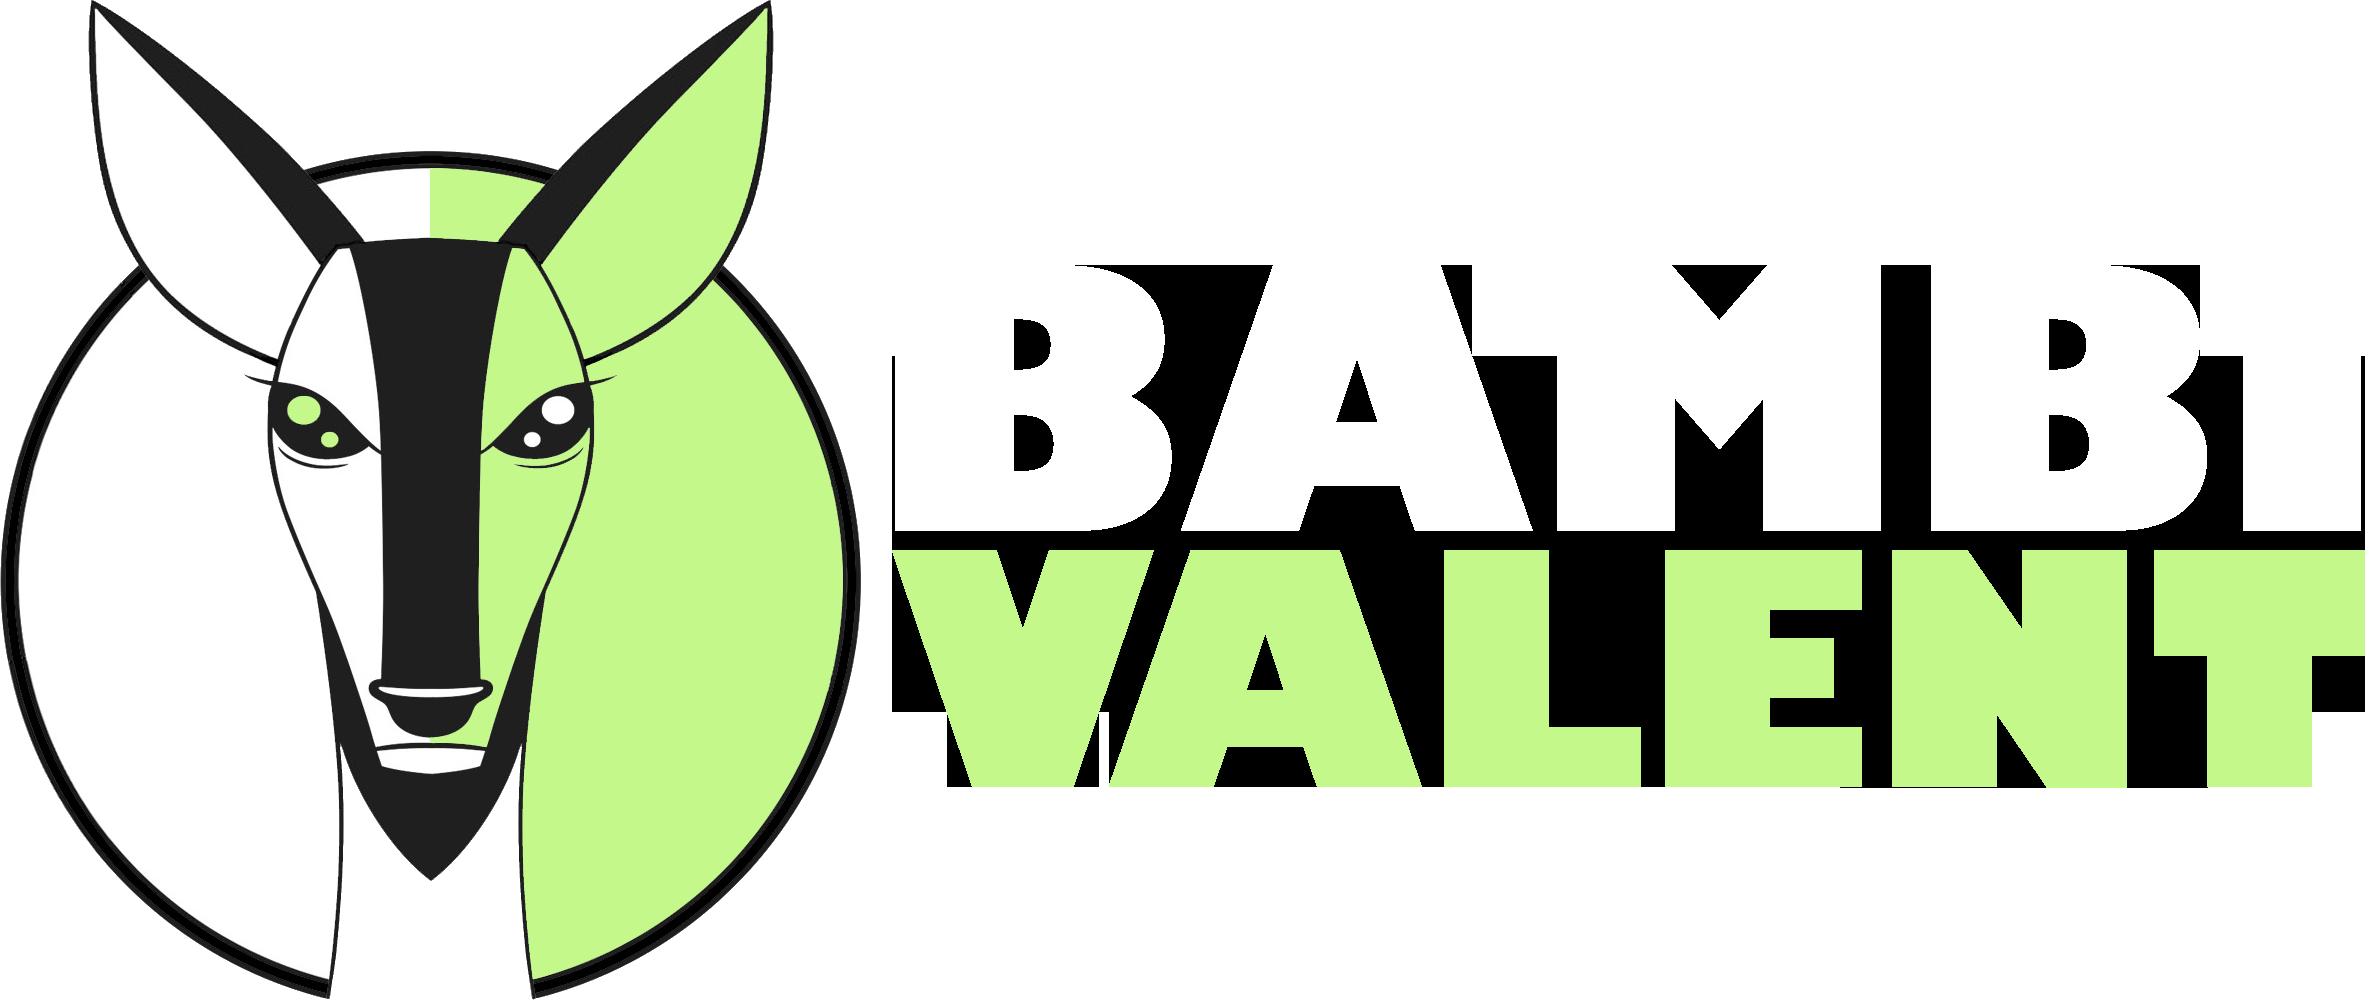 Bambivalent